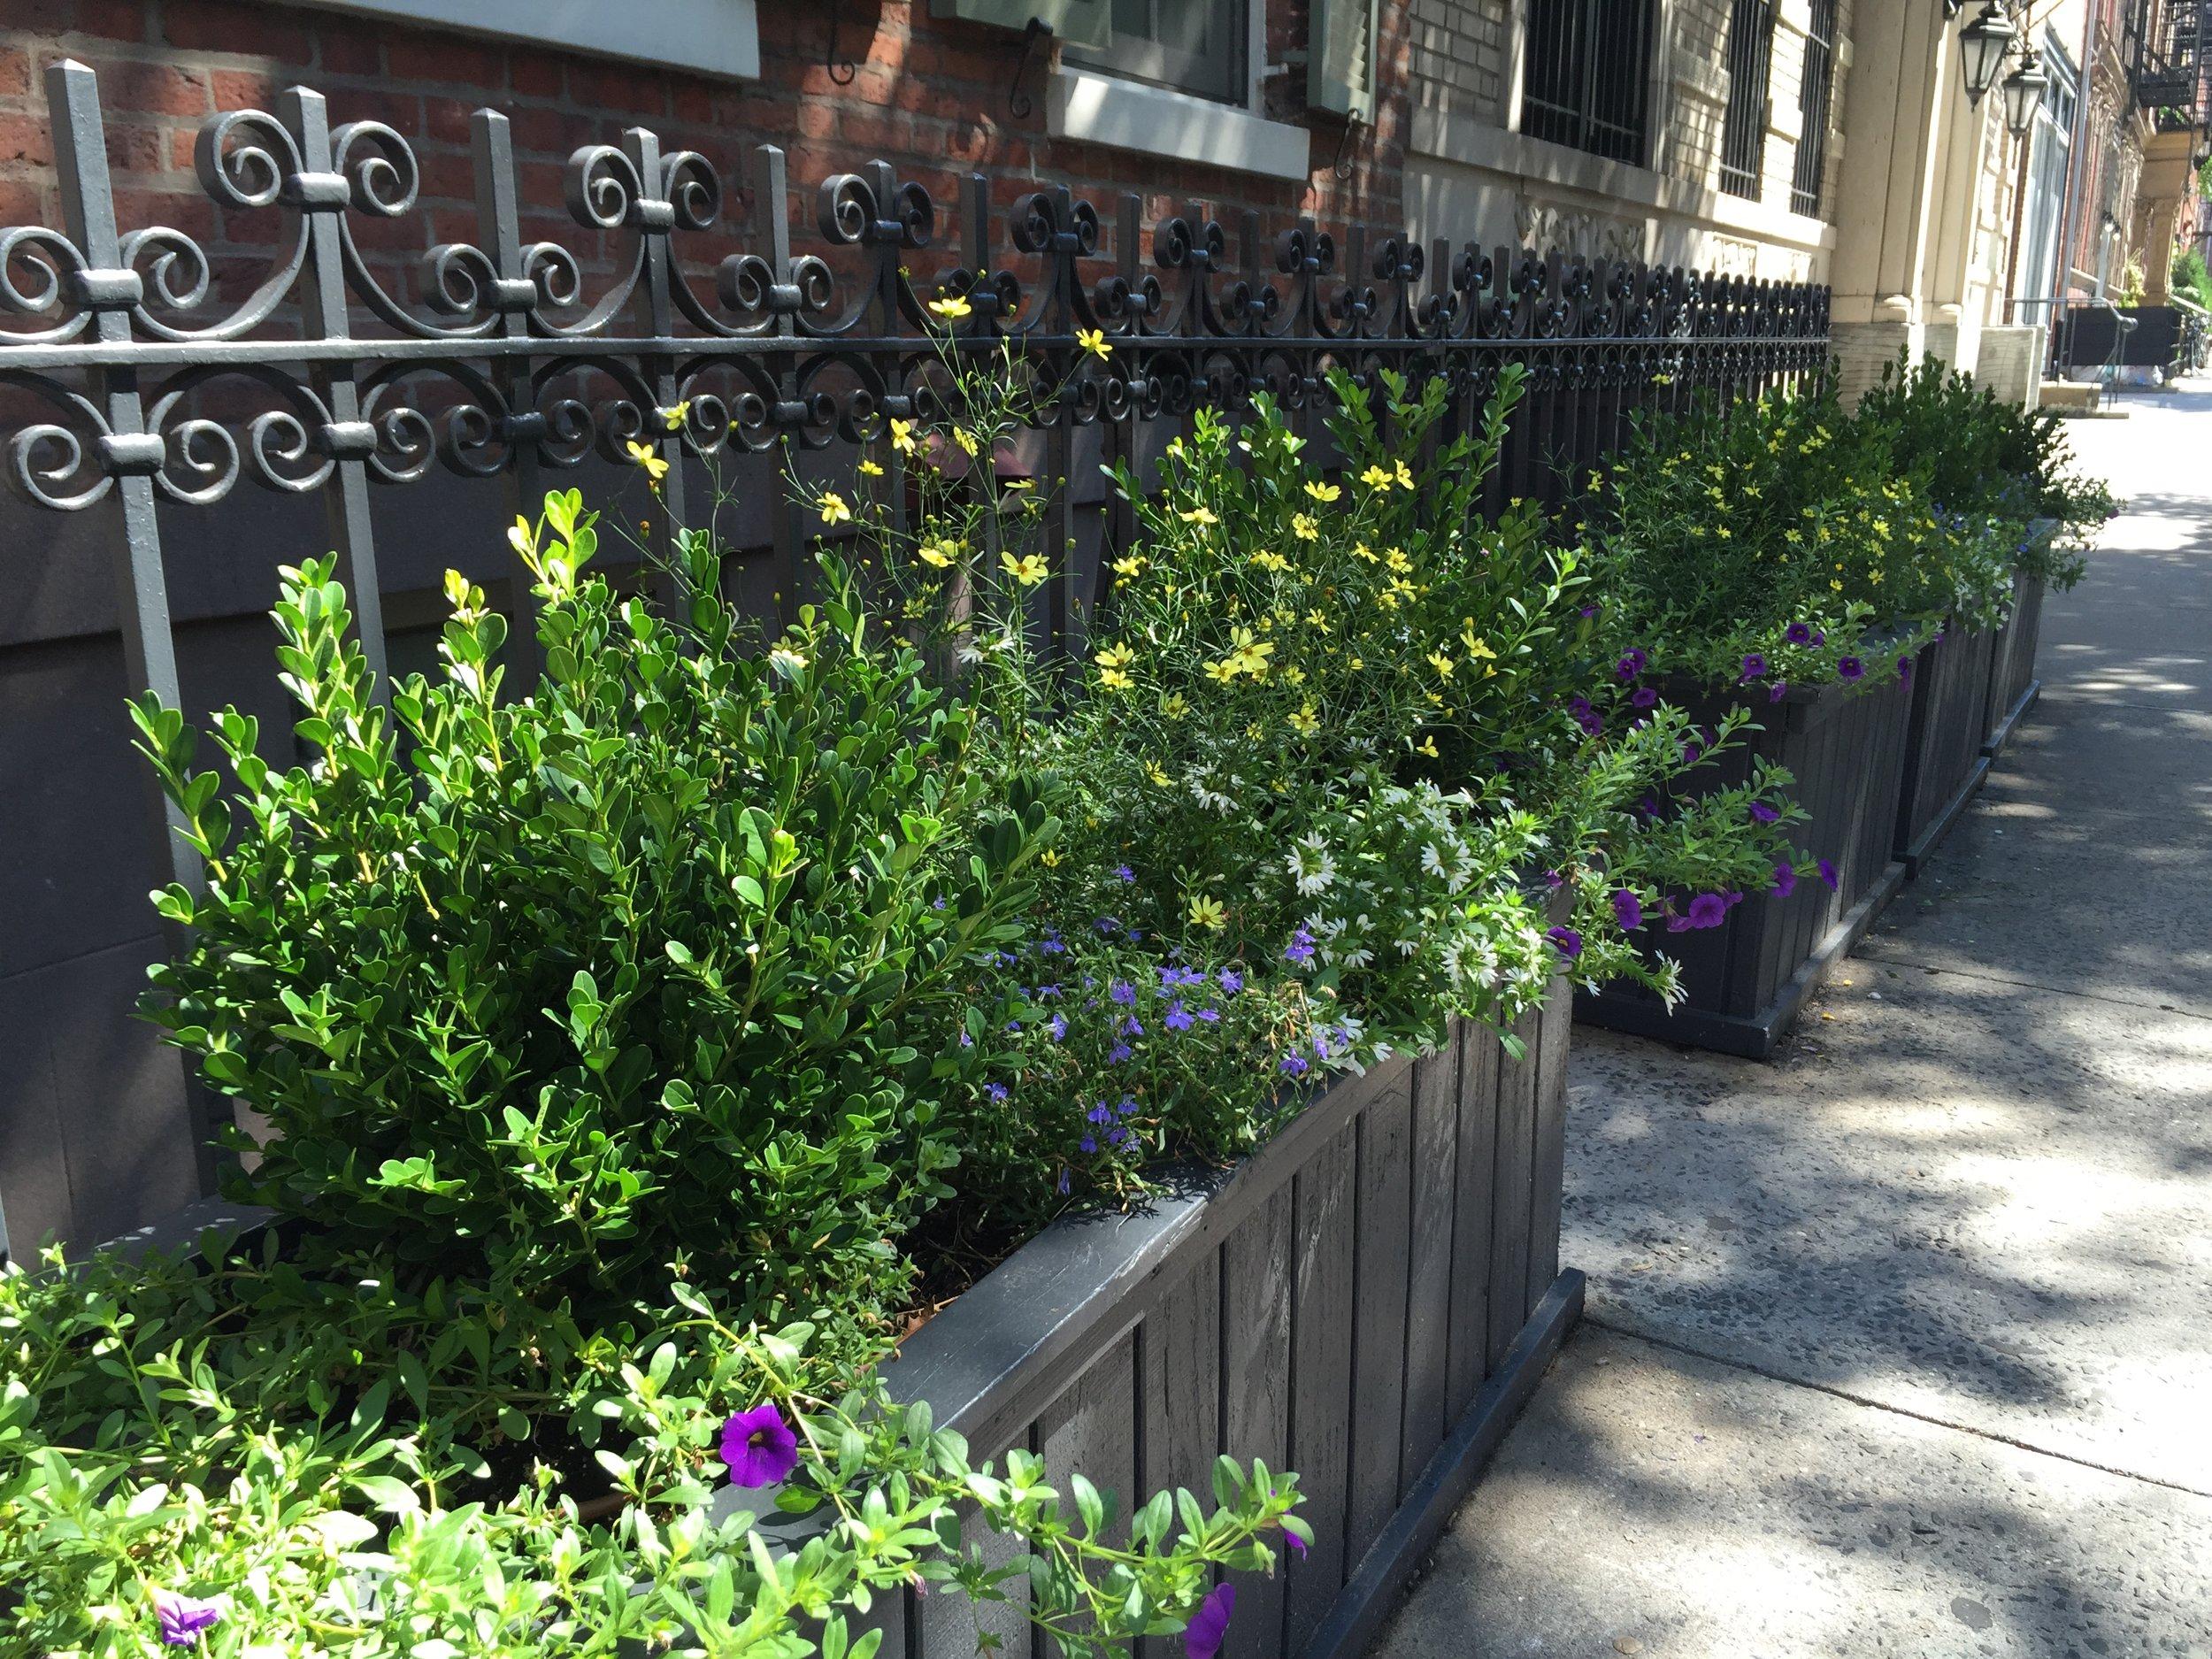 West Village Entrance Row